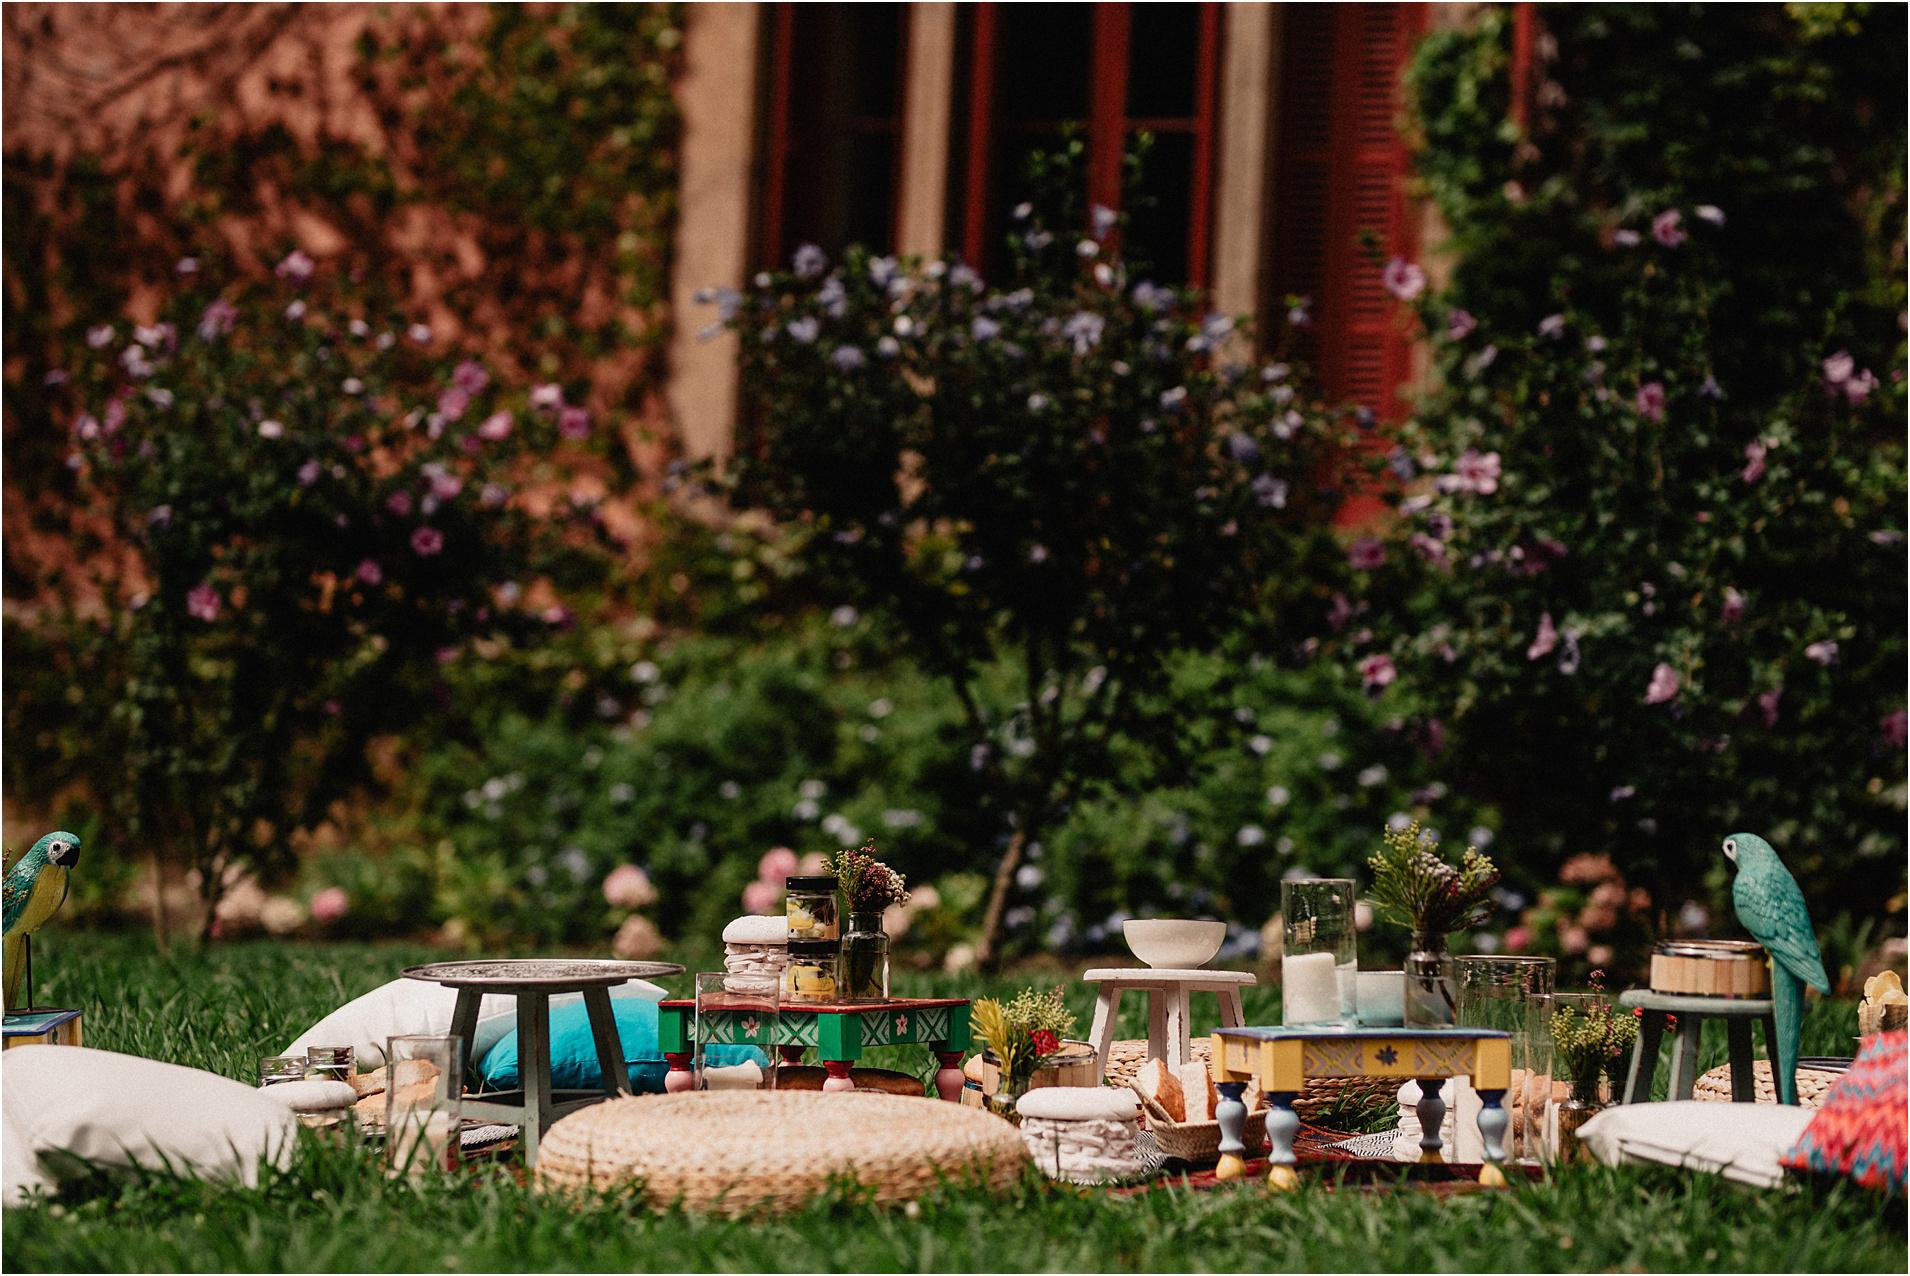 Fotografía y video en Palacio de Arbaisenea Bodas San Sebastián Donostia Guipuzcoa - Finca Arbaisenea by Maher Catering Wedding films and photography-5.jpg